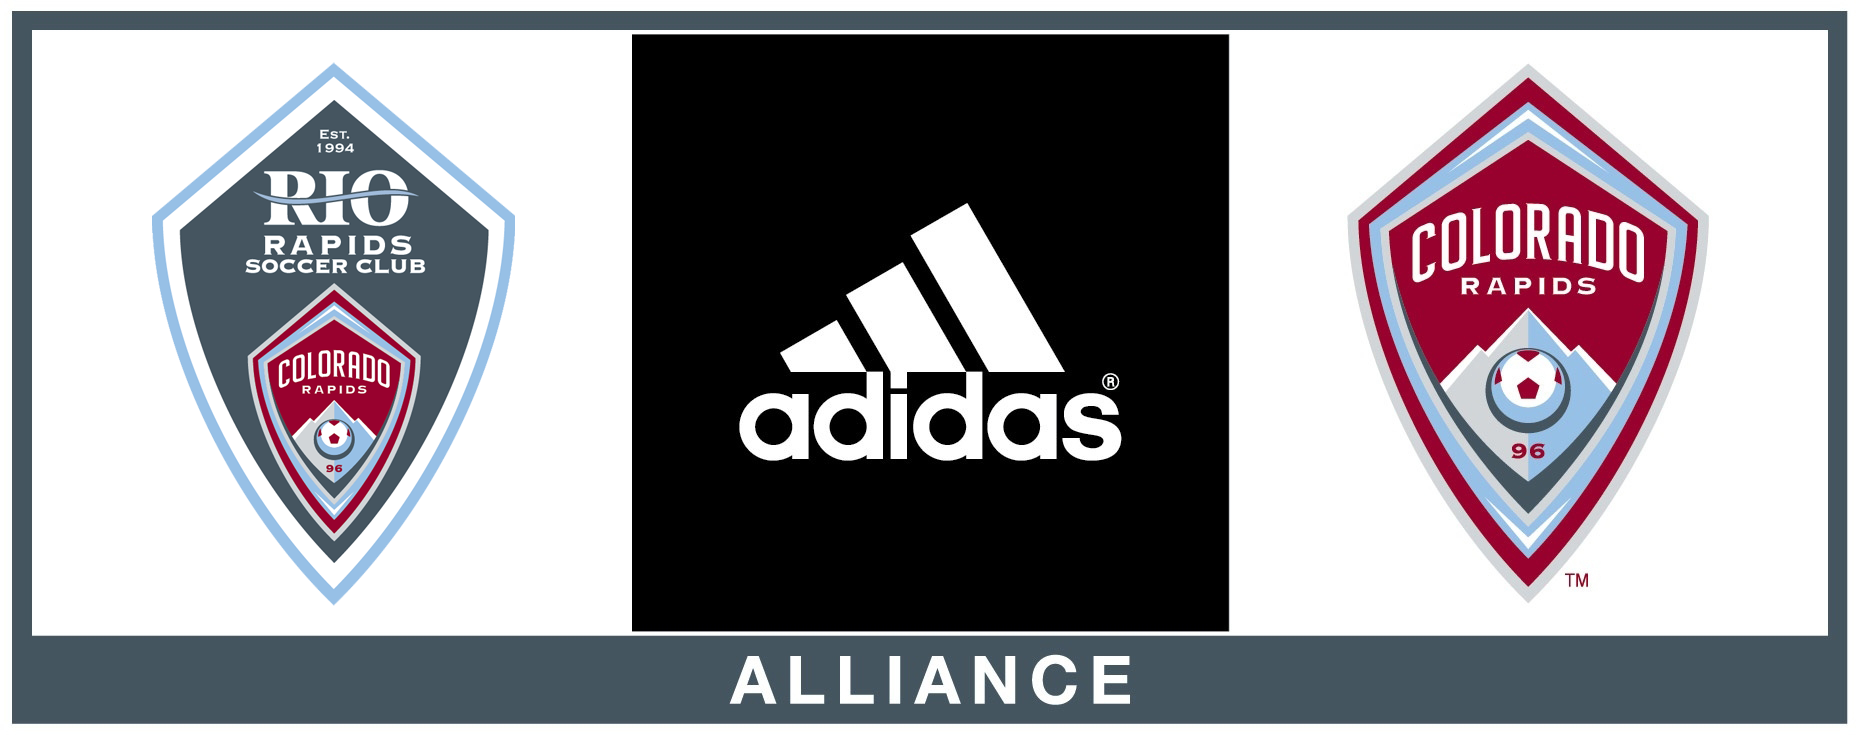 Rrsc adidas alliance graphic